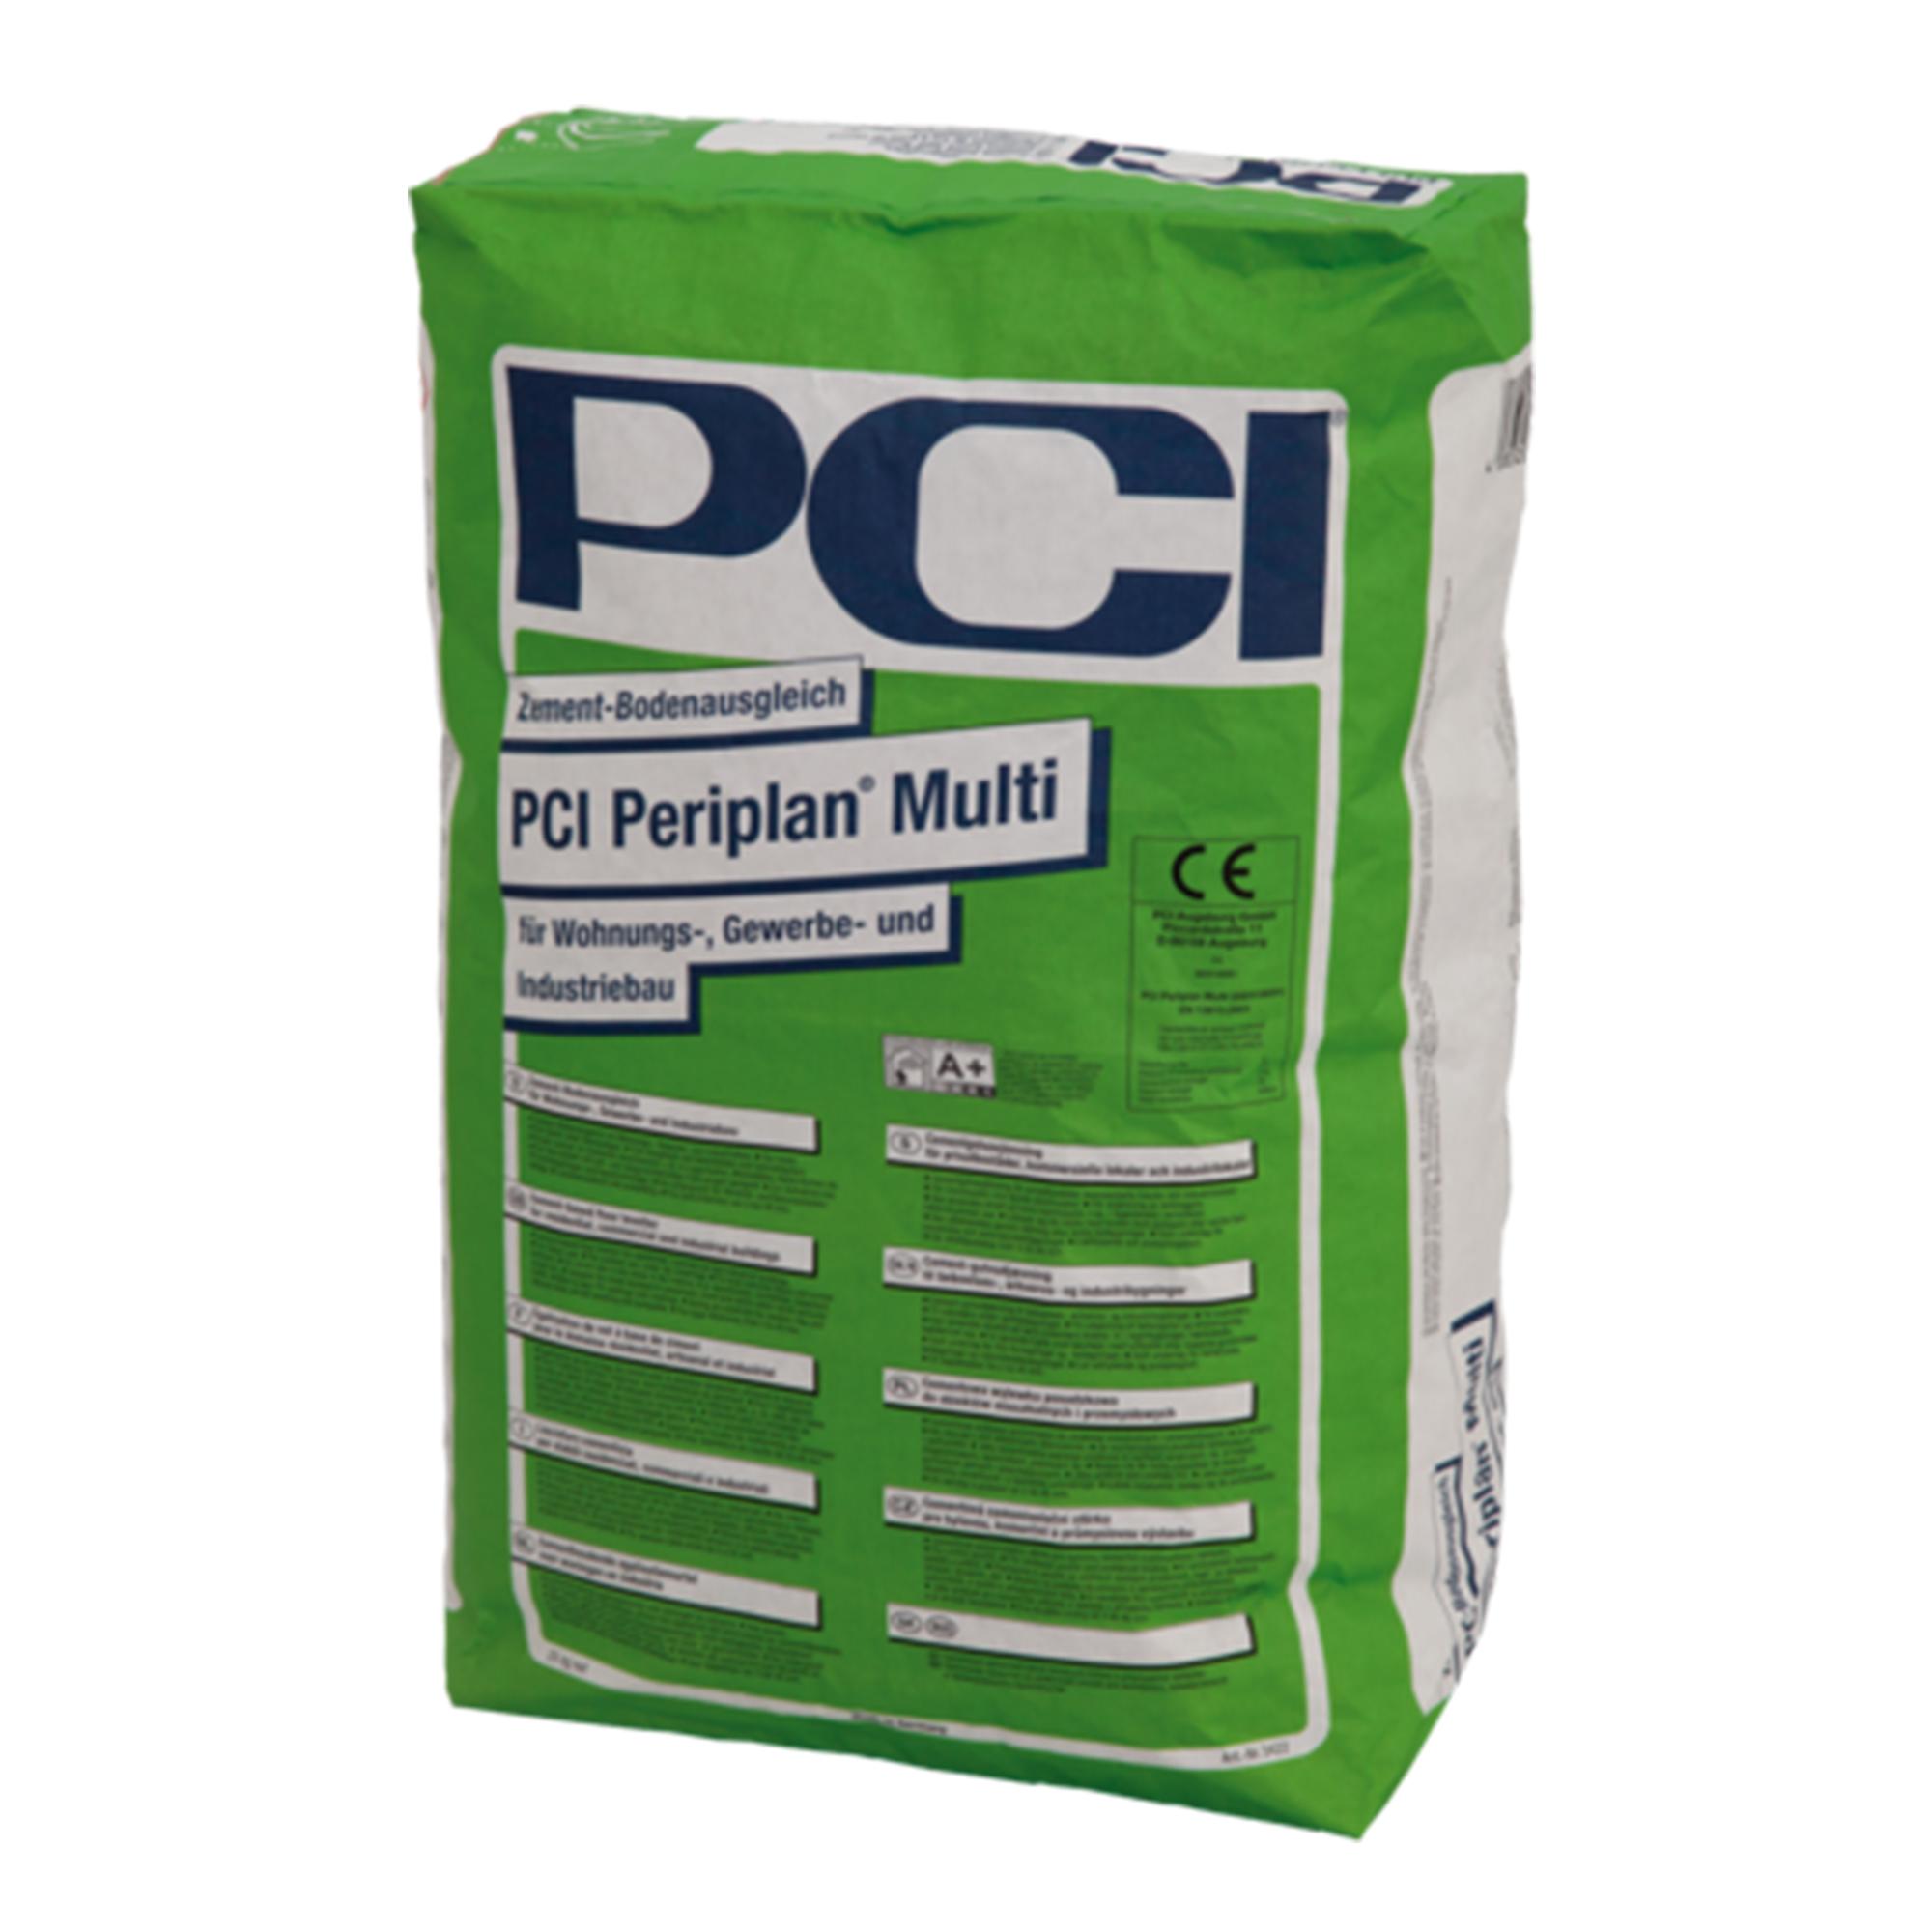 Golvspackel PCI Periplan Multi 25 kg